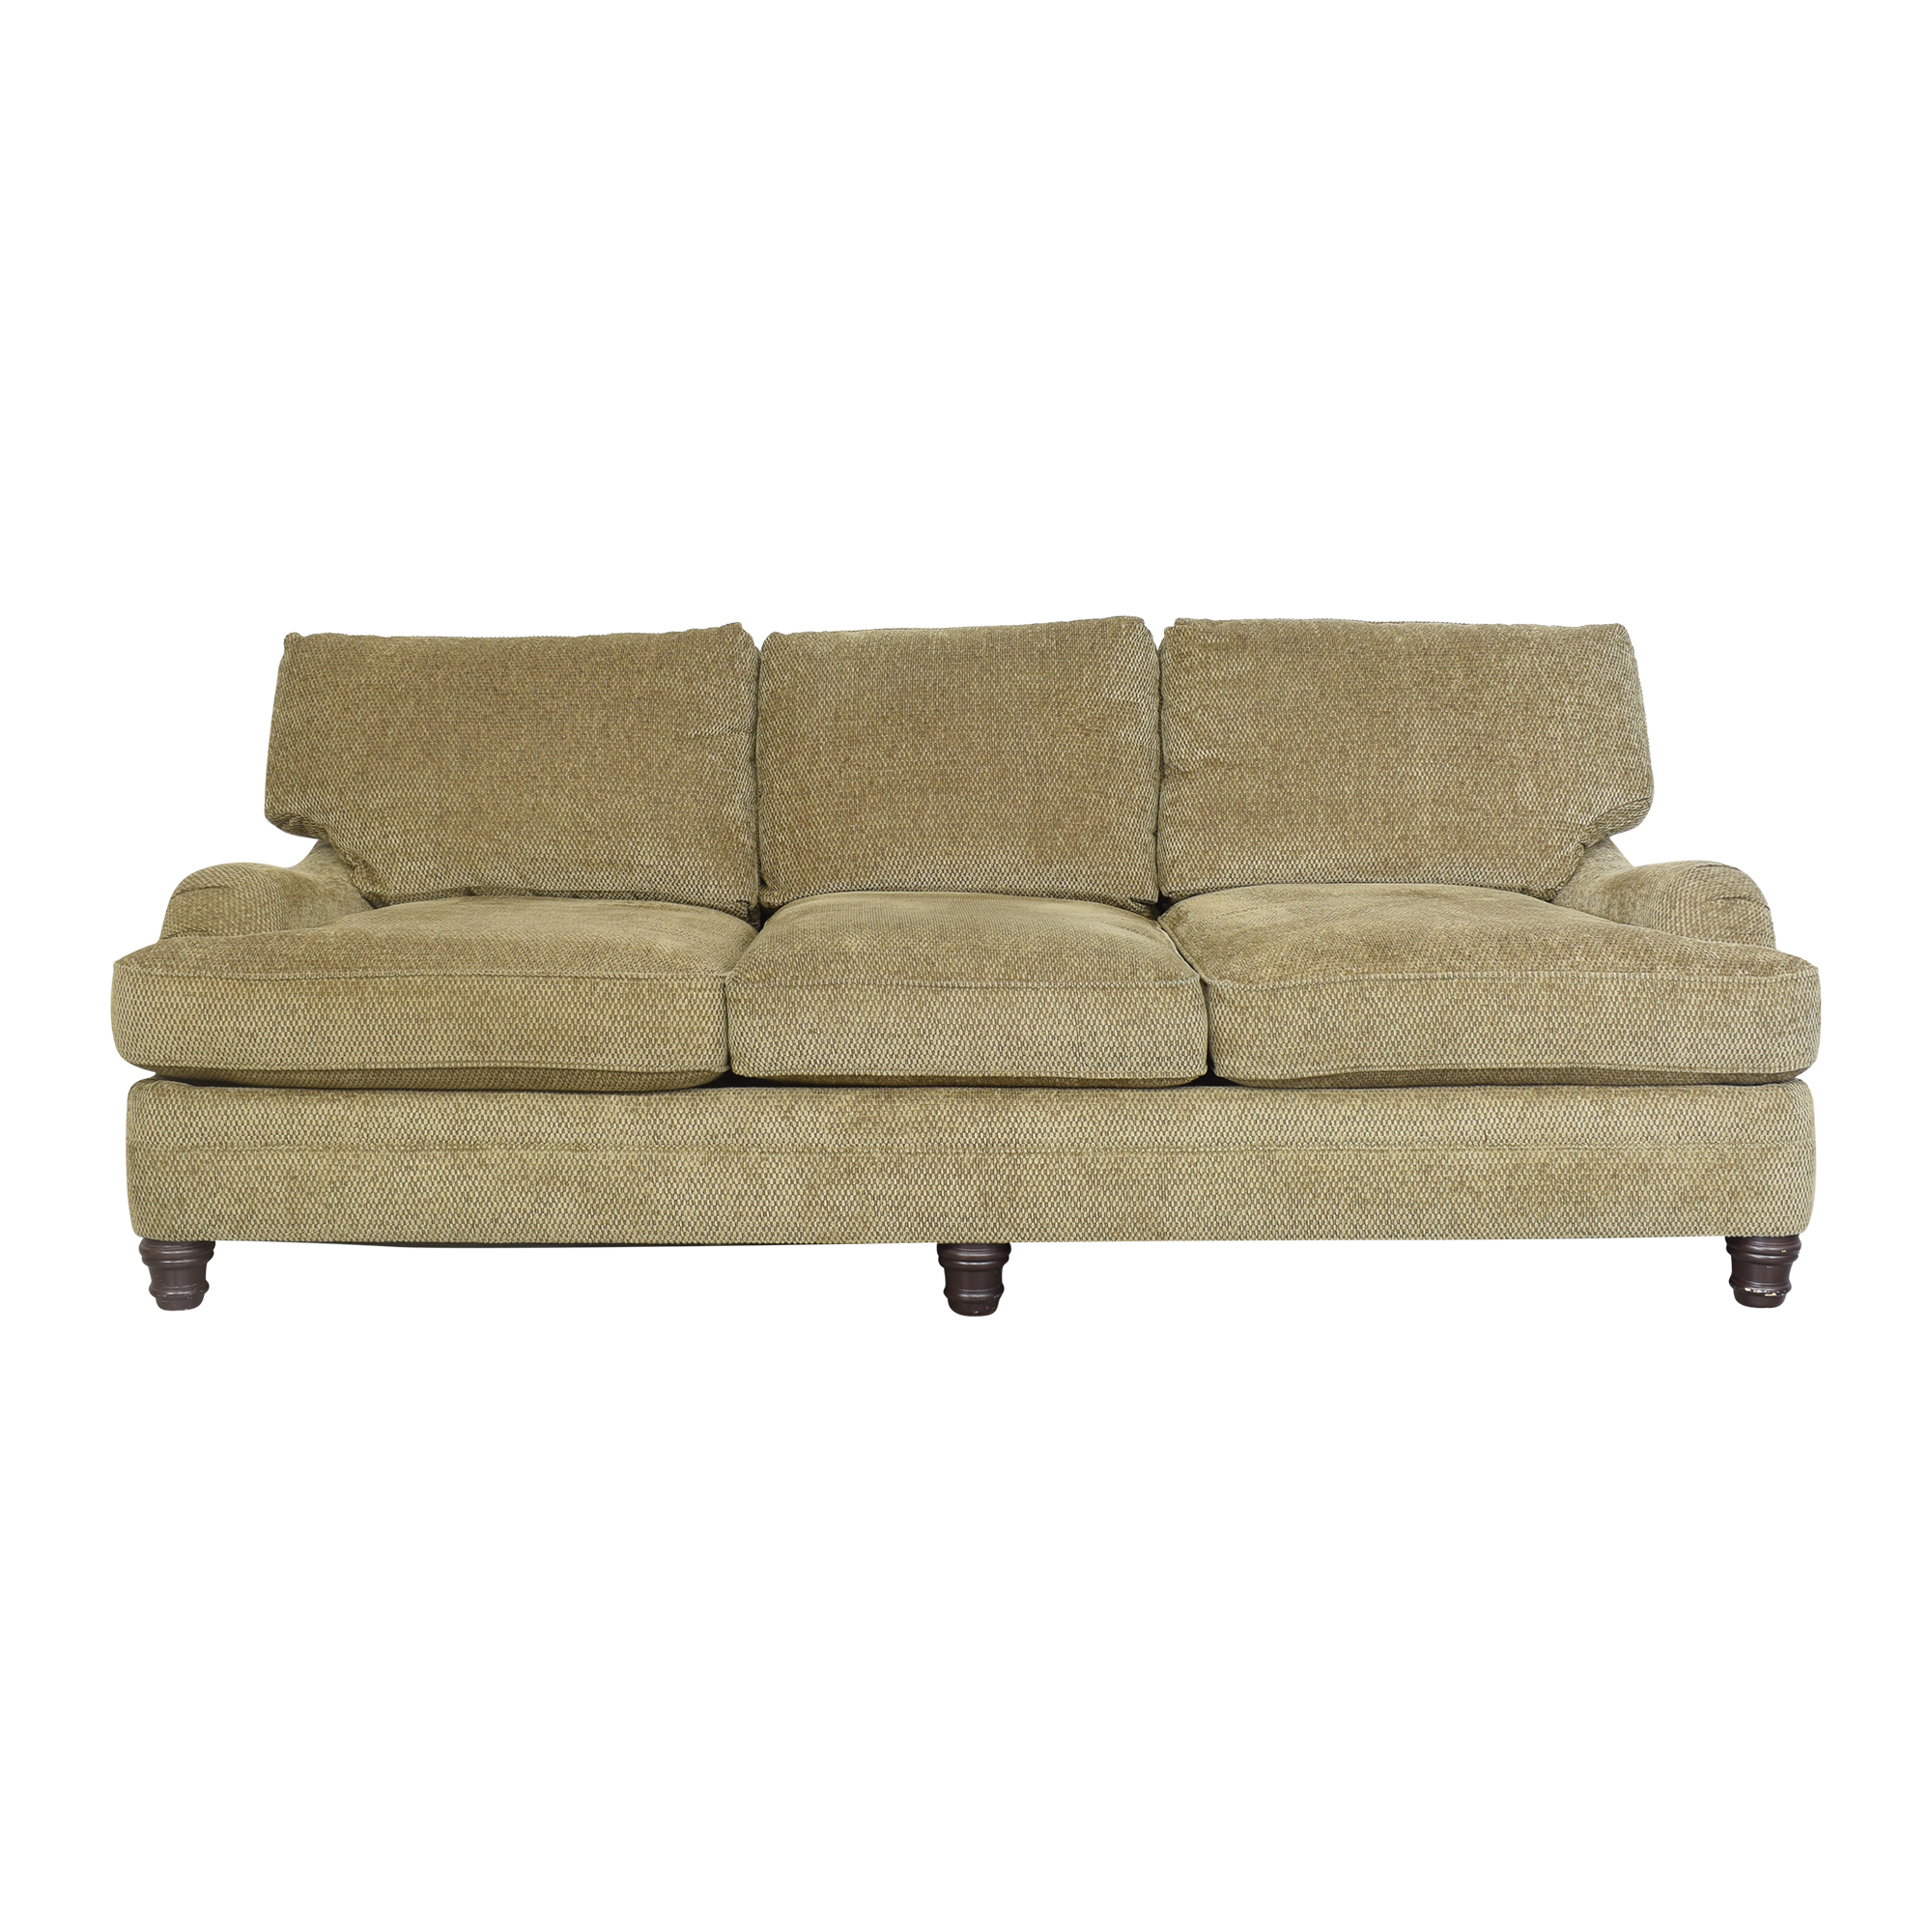 Bernhardt Tarleton Sofa sale